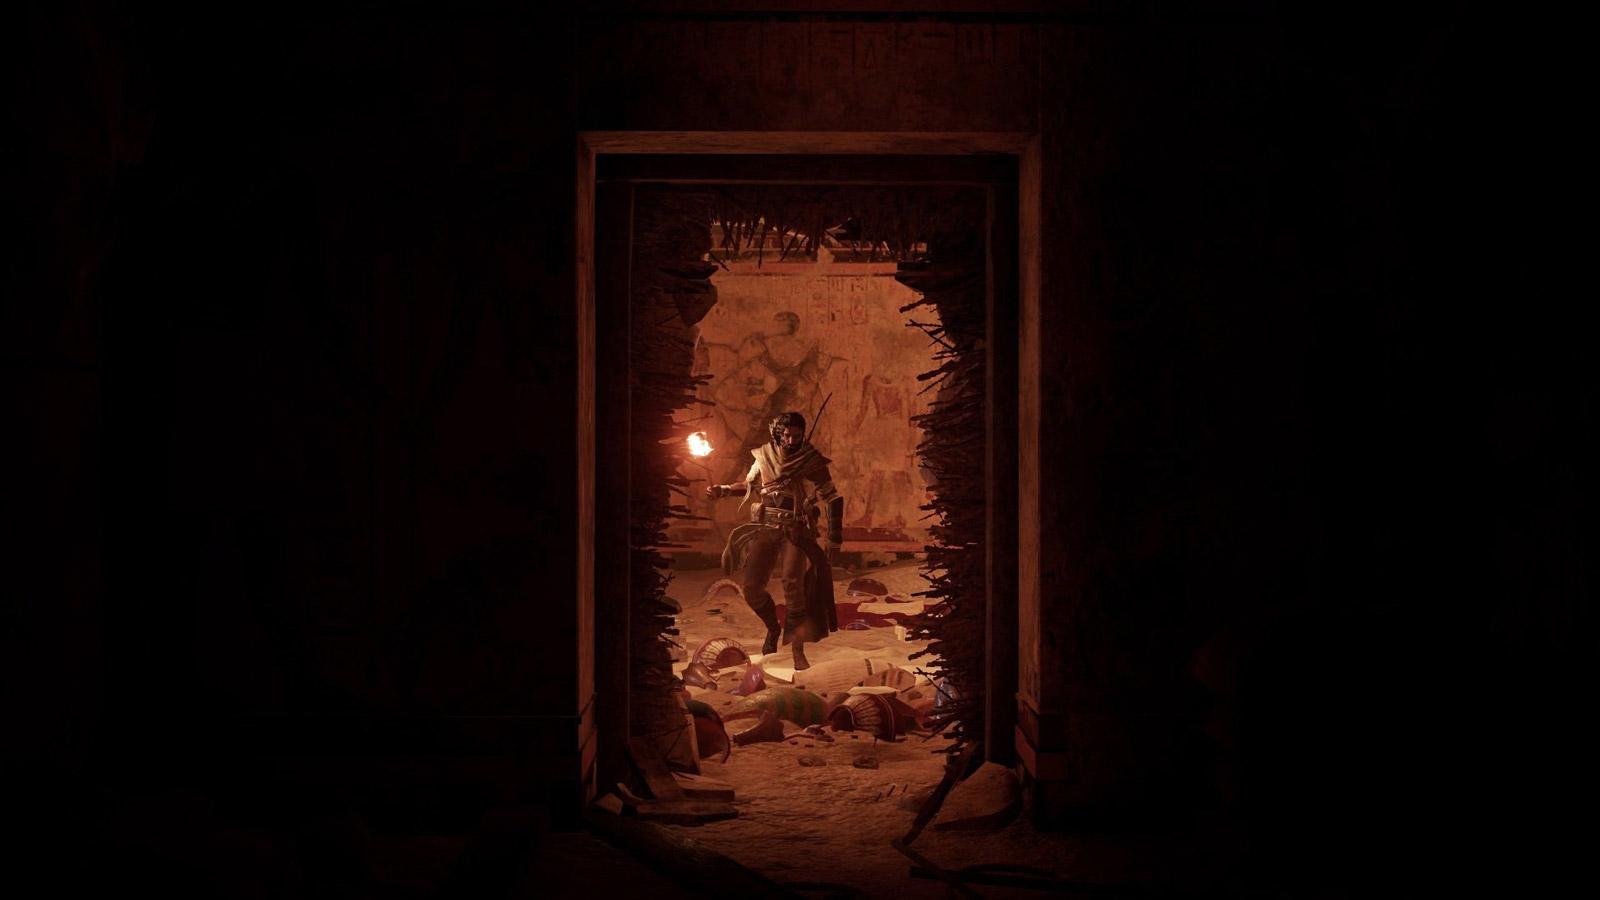 Assassin's Creed Origins Wallpaper in 1600x900